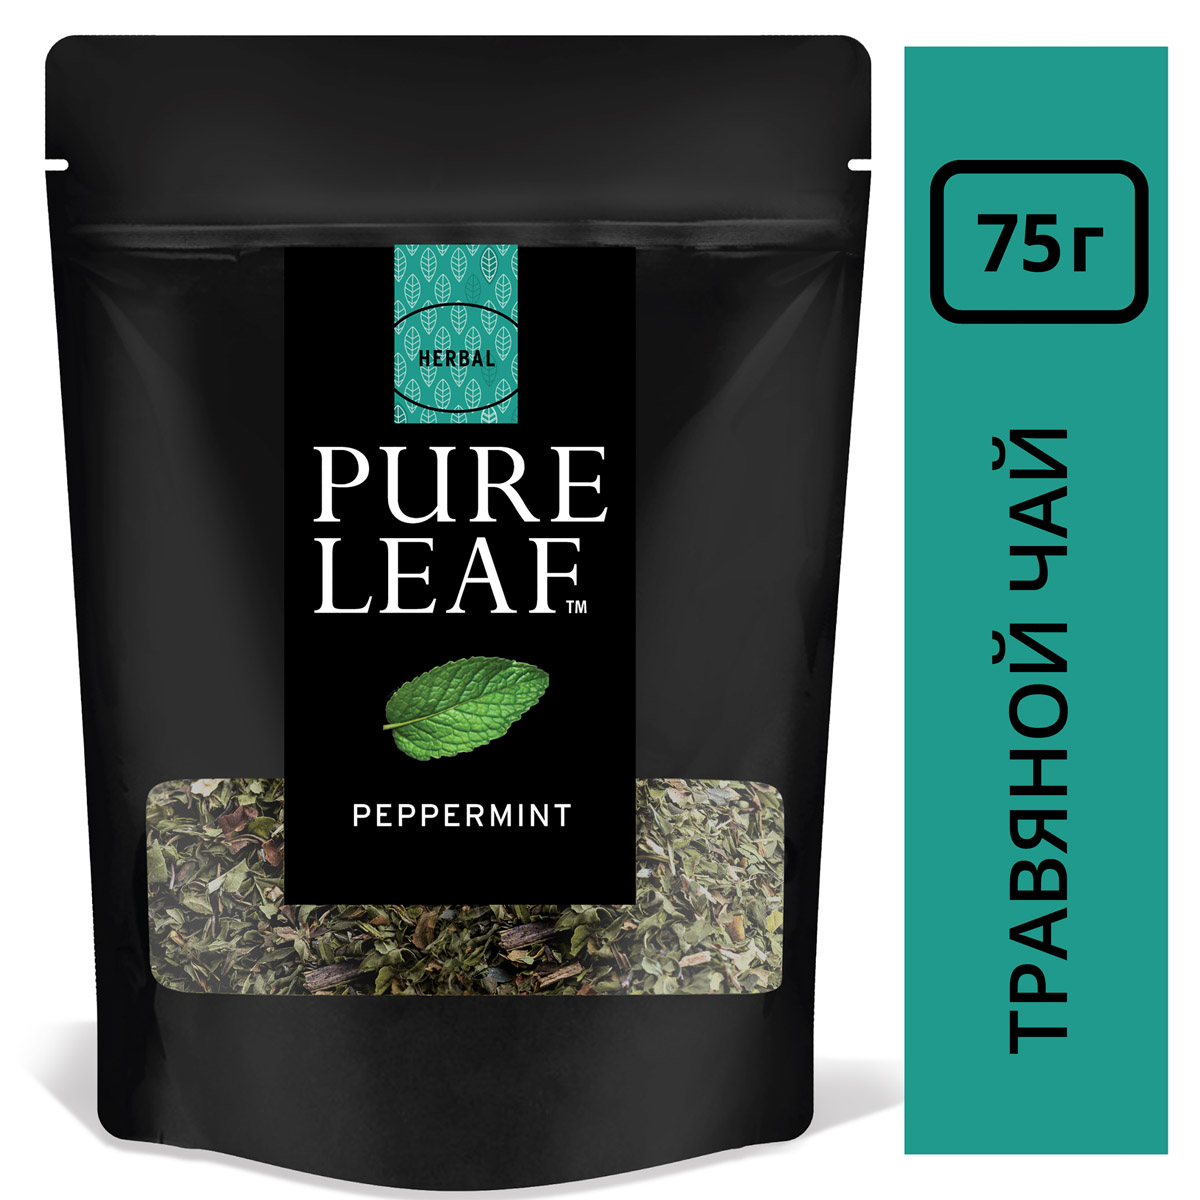 PURE LEAF травяной напиток Peppermint (75г) - Крупнолистовой чай